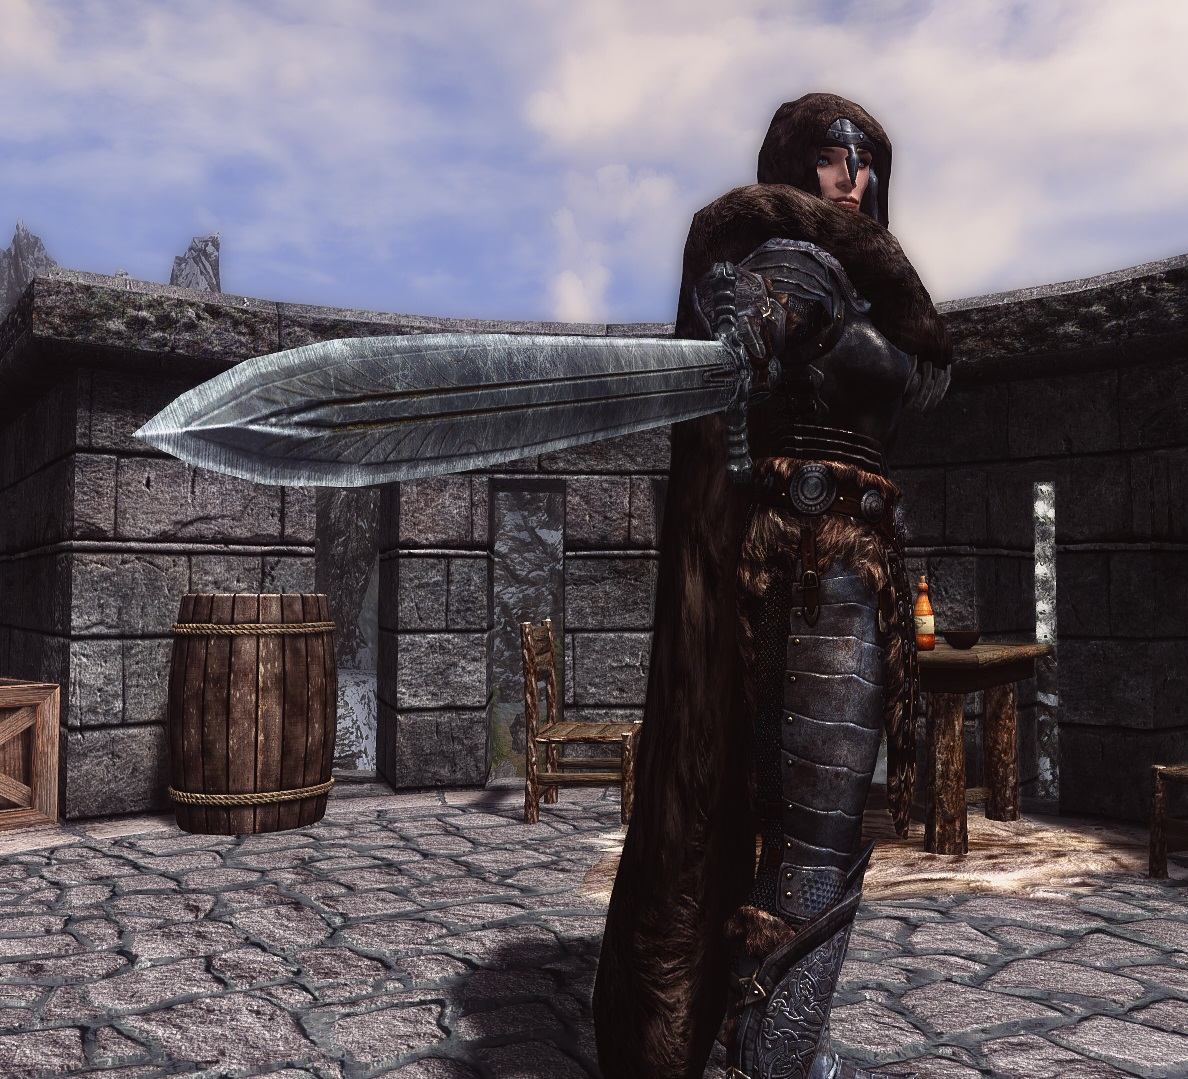 Swor - Elder Scrolls 5: Skyrim, the